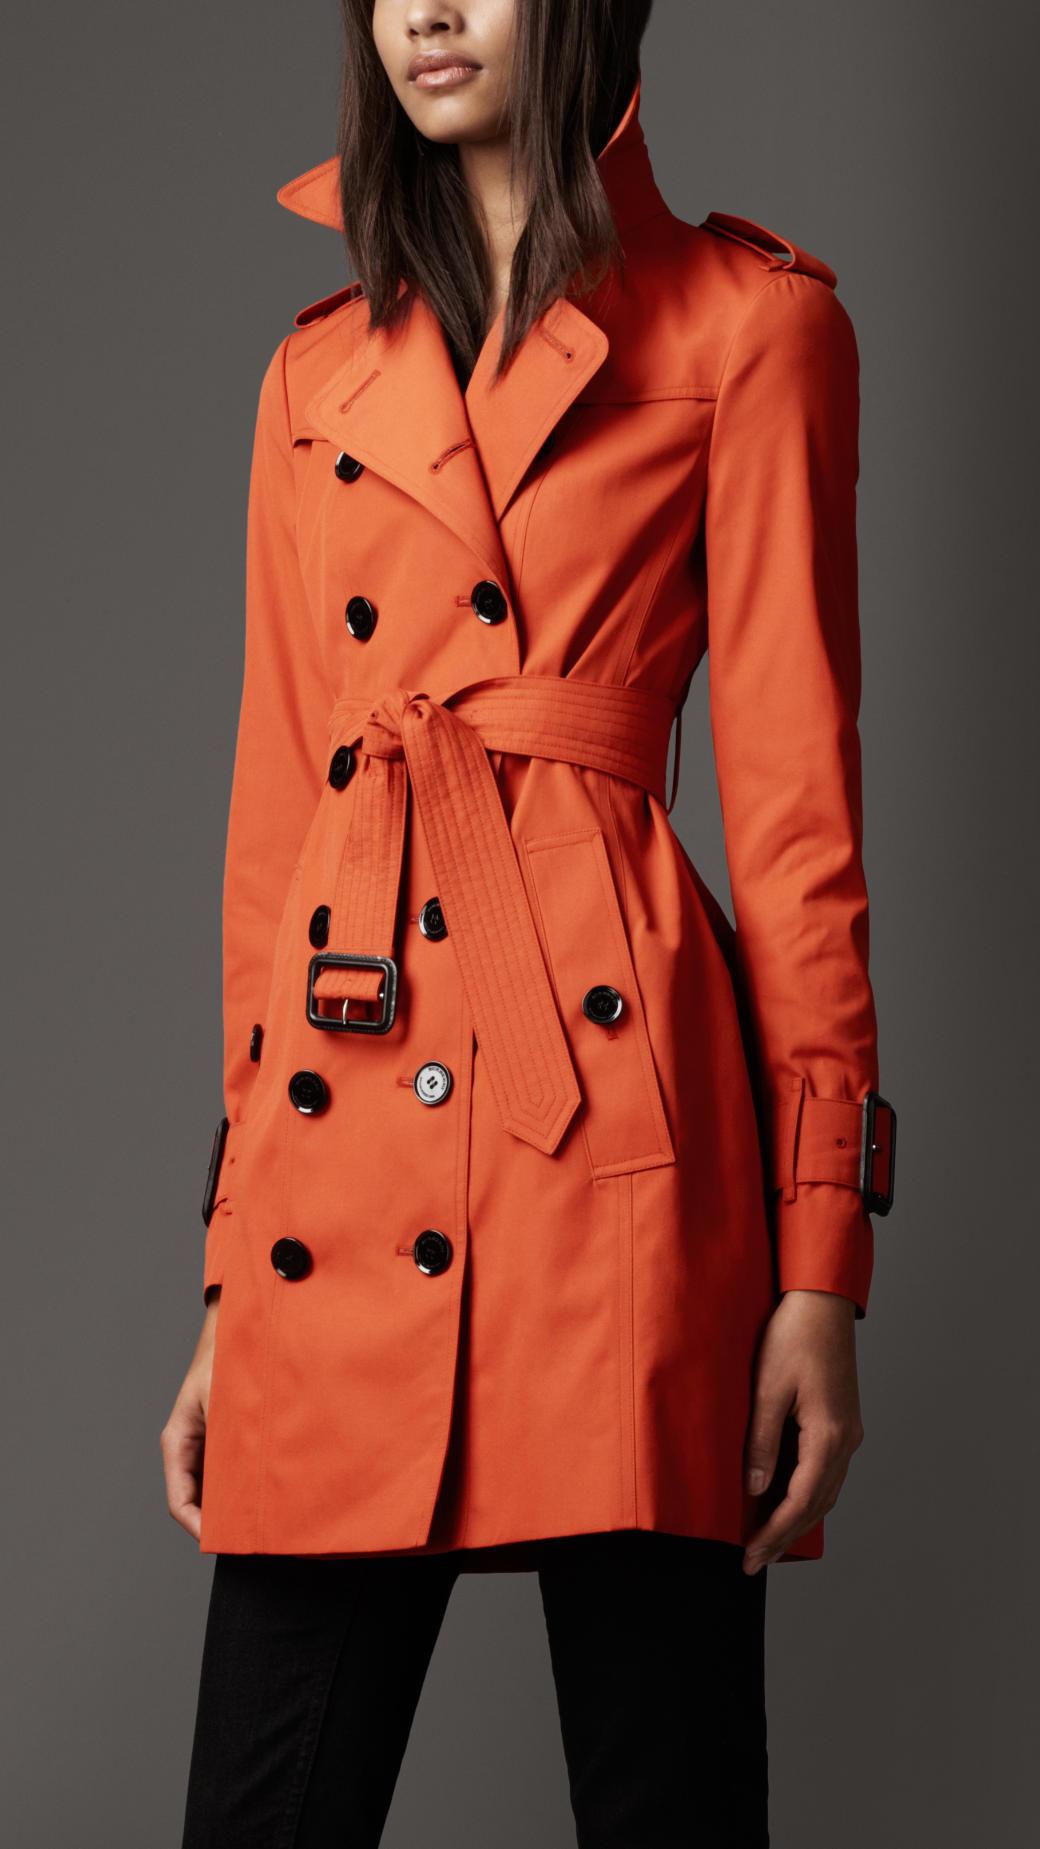 burberry midlength cotton blend trench coat in orange lyst. Black Bedroom Furniture Sets. Home Design Ideas